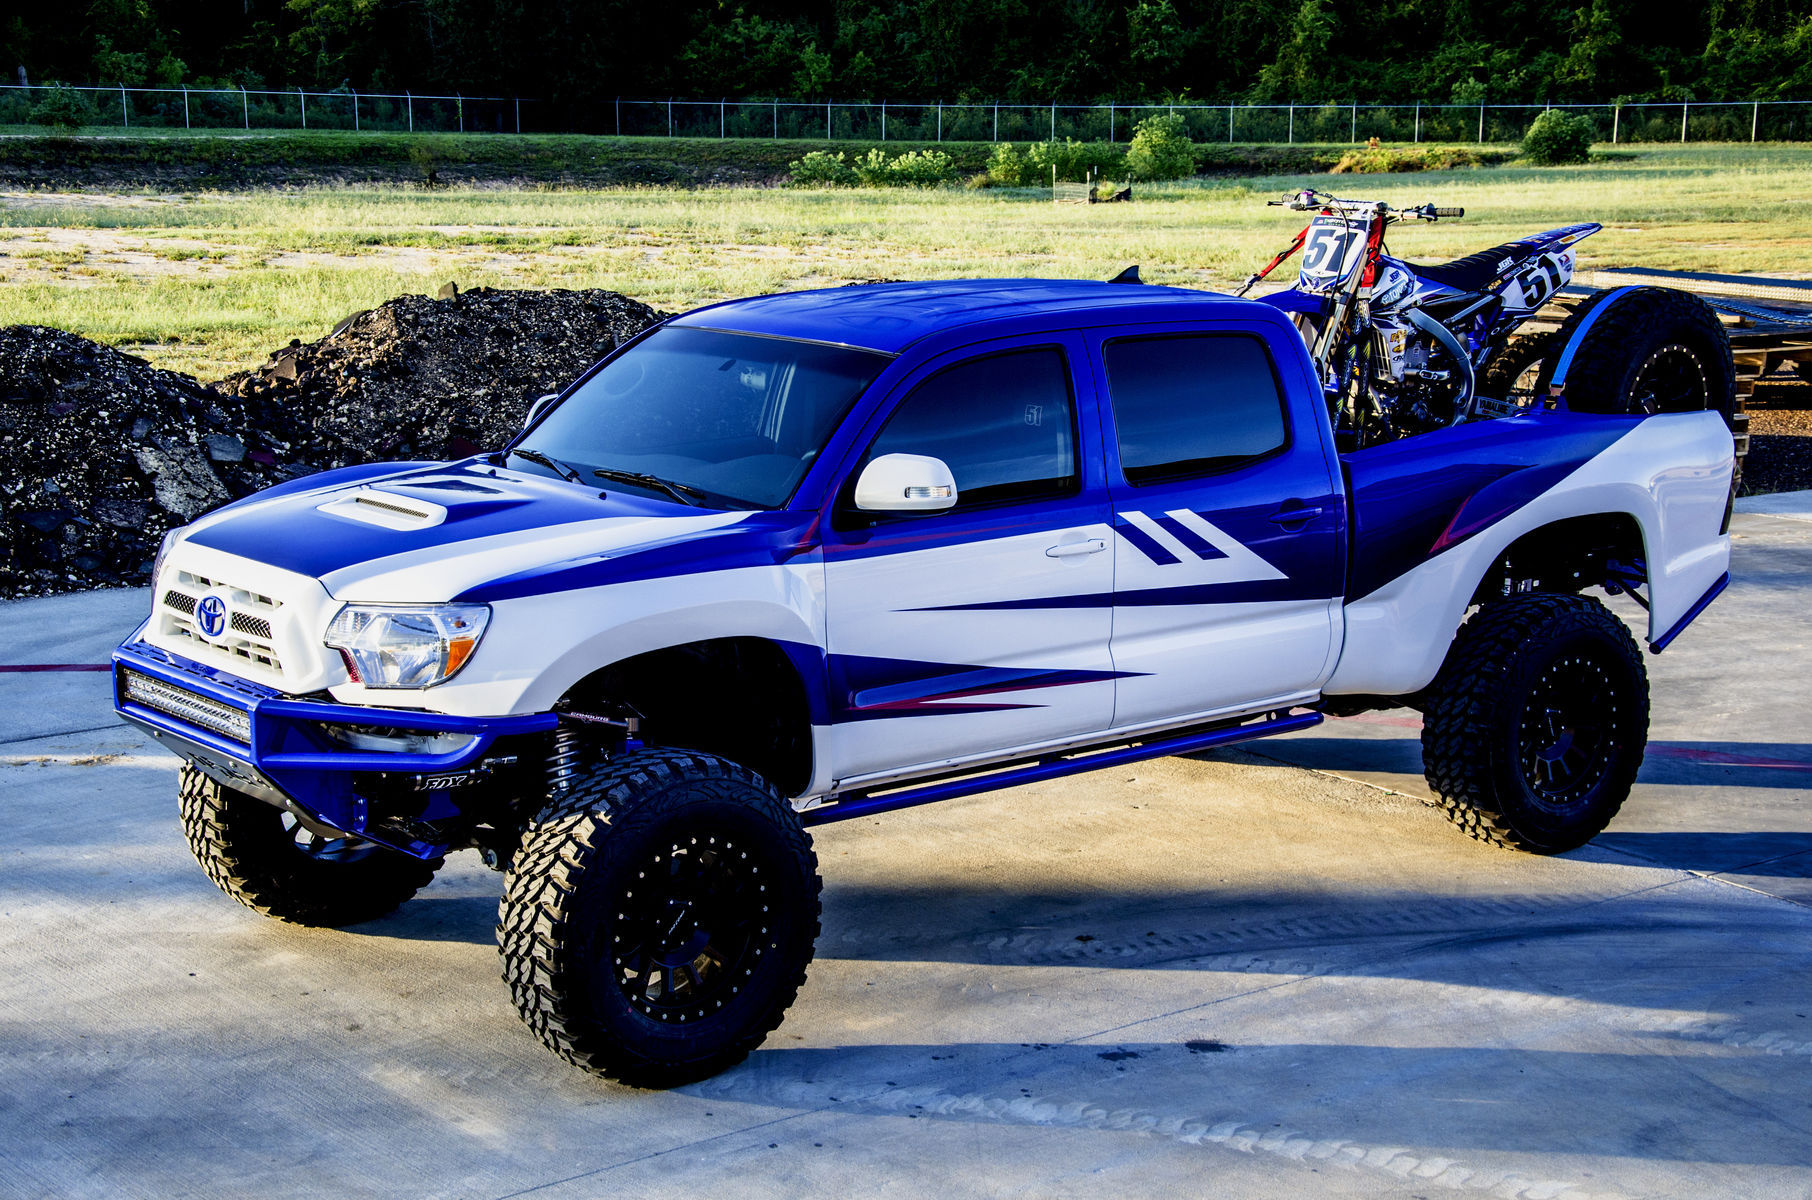 Toyota Tacoma   Justin Barcia's JGR Build